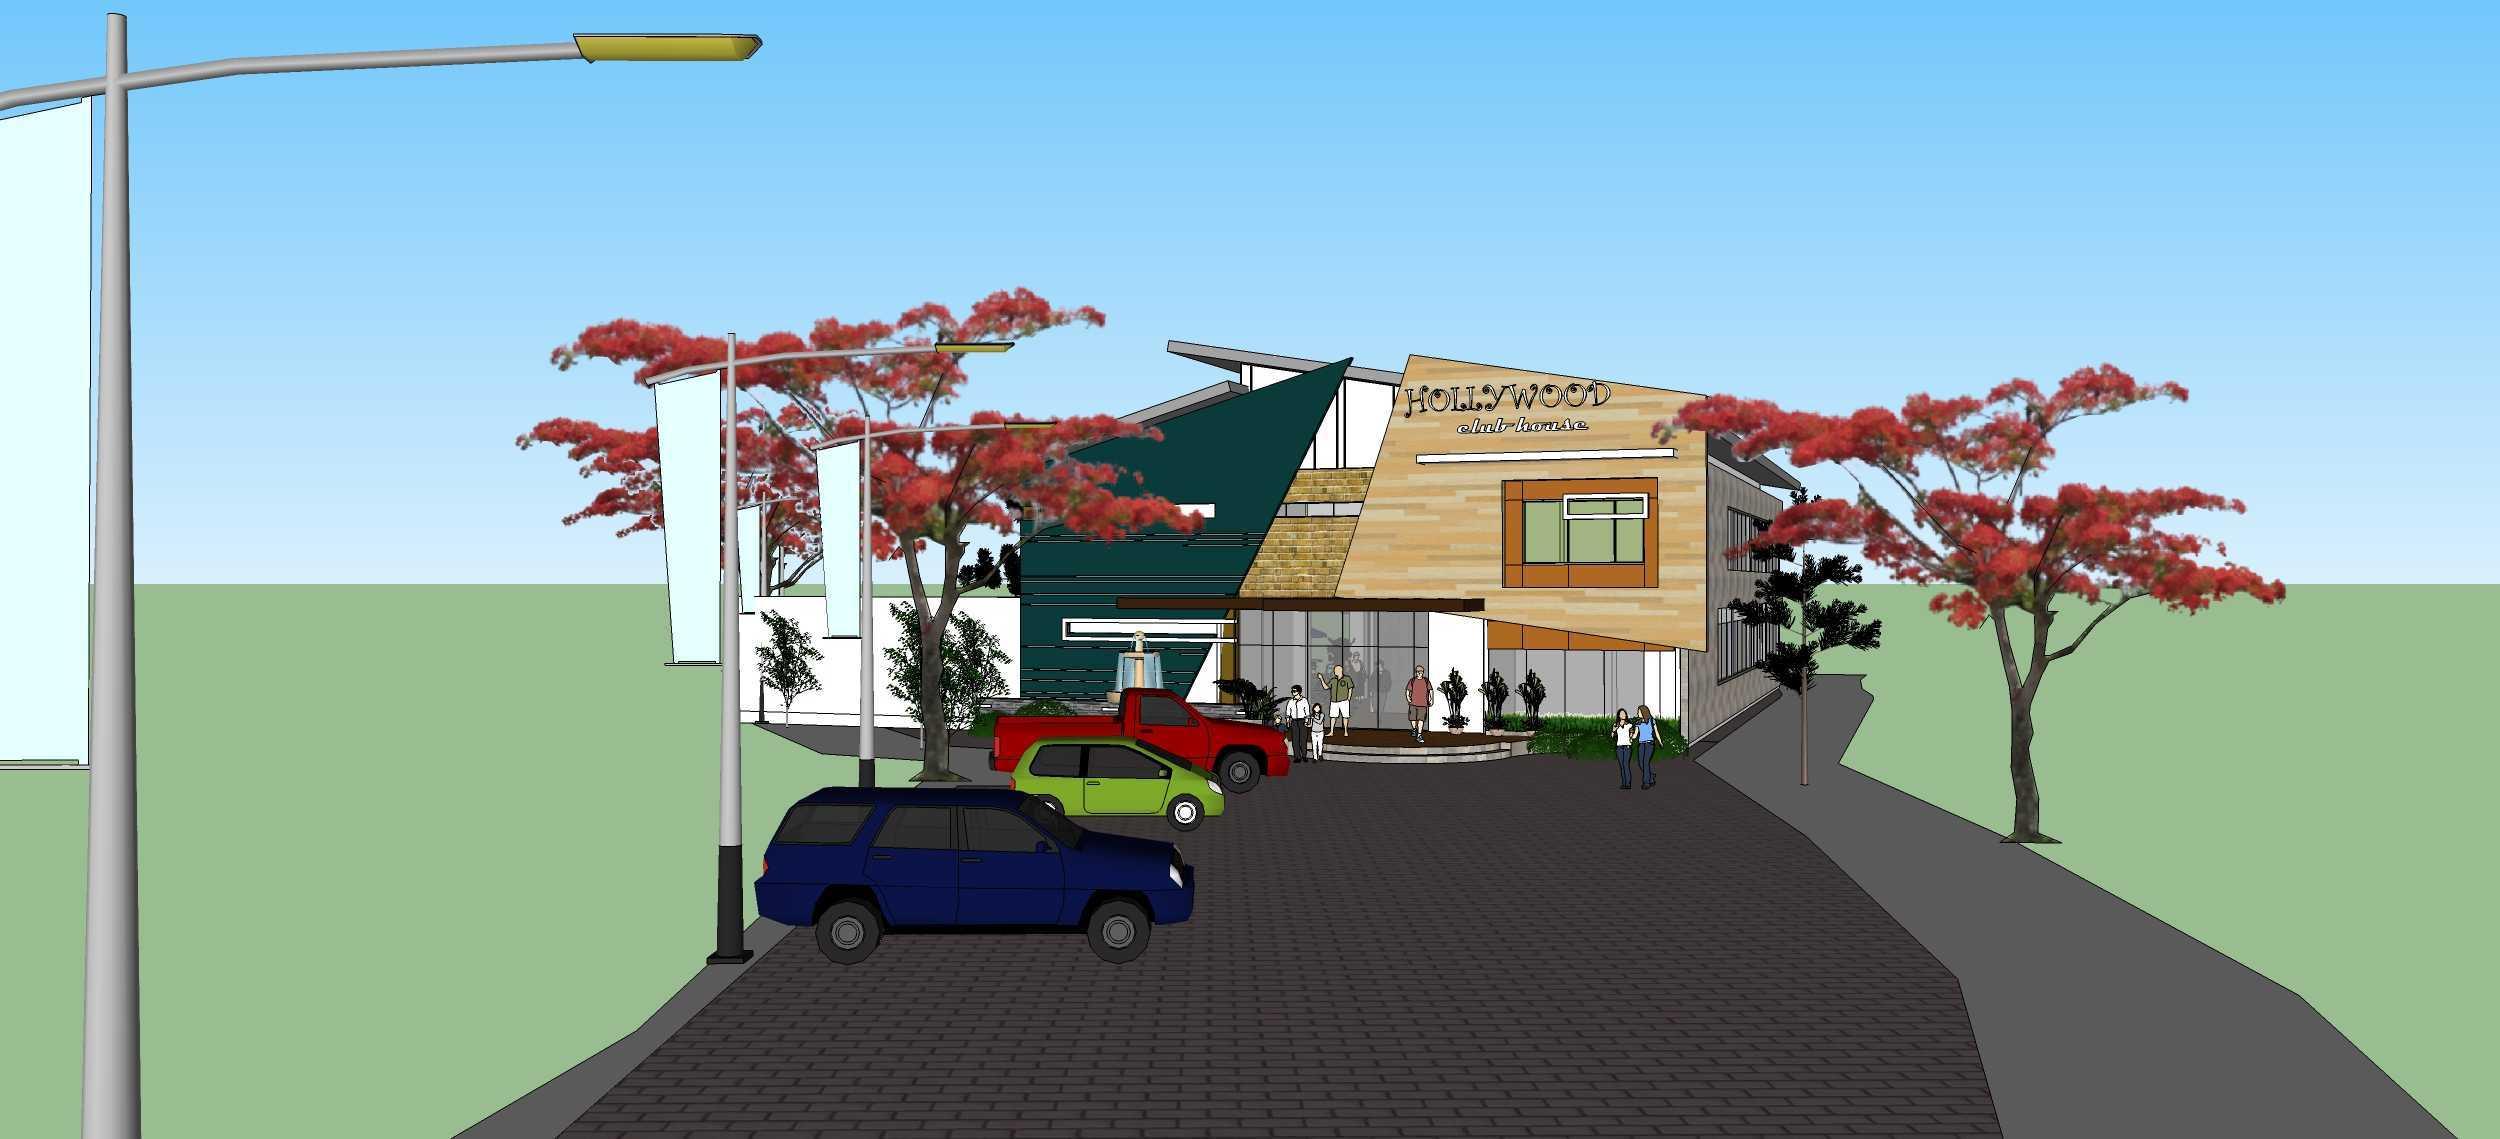 Wicaksono Pandyo Prasasto Hollywood Square Bogor, Jawa Barat Bogor, Jawa Barat Club-House-1   27004